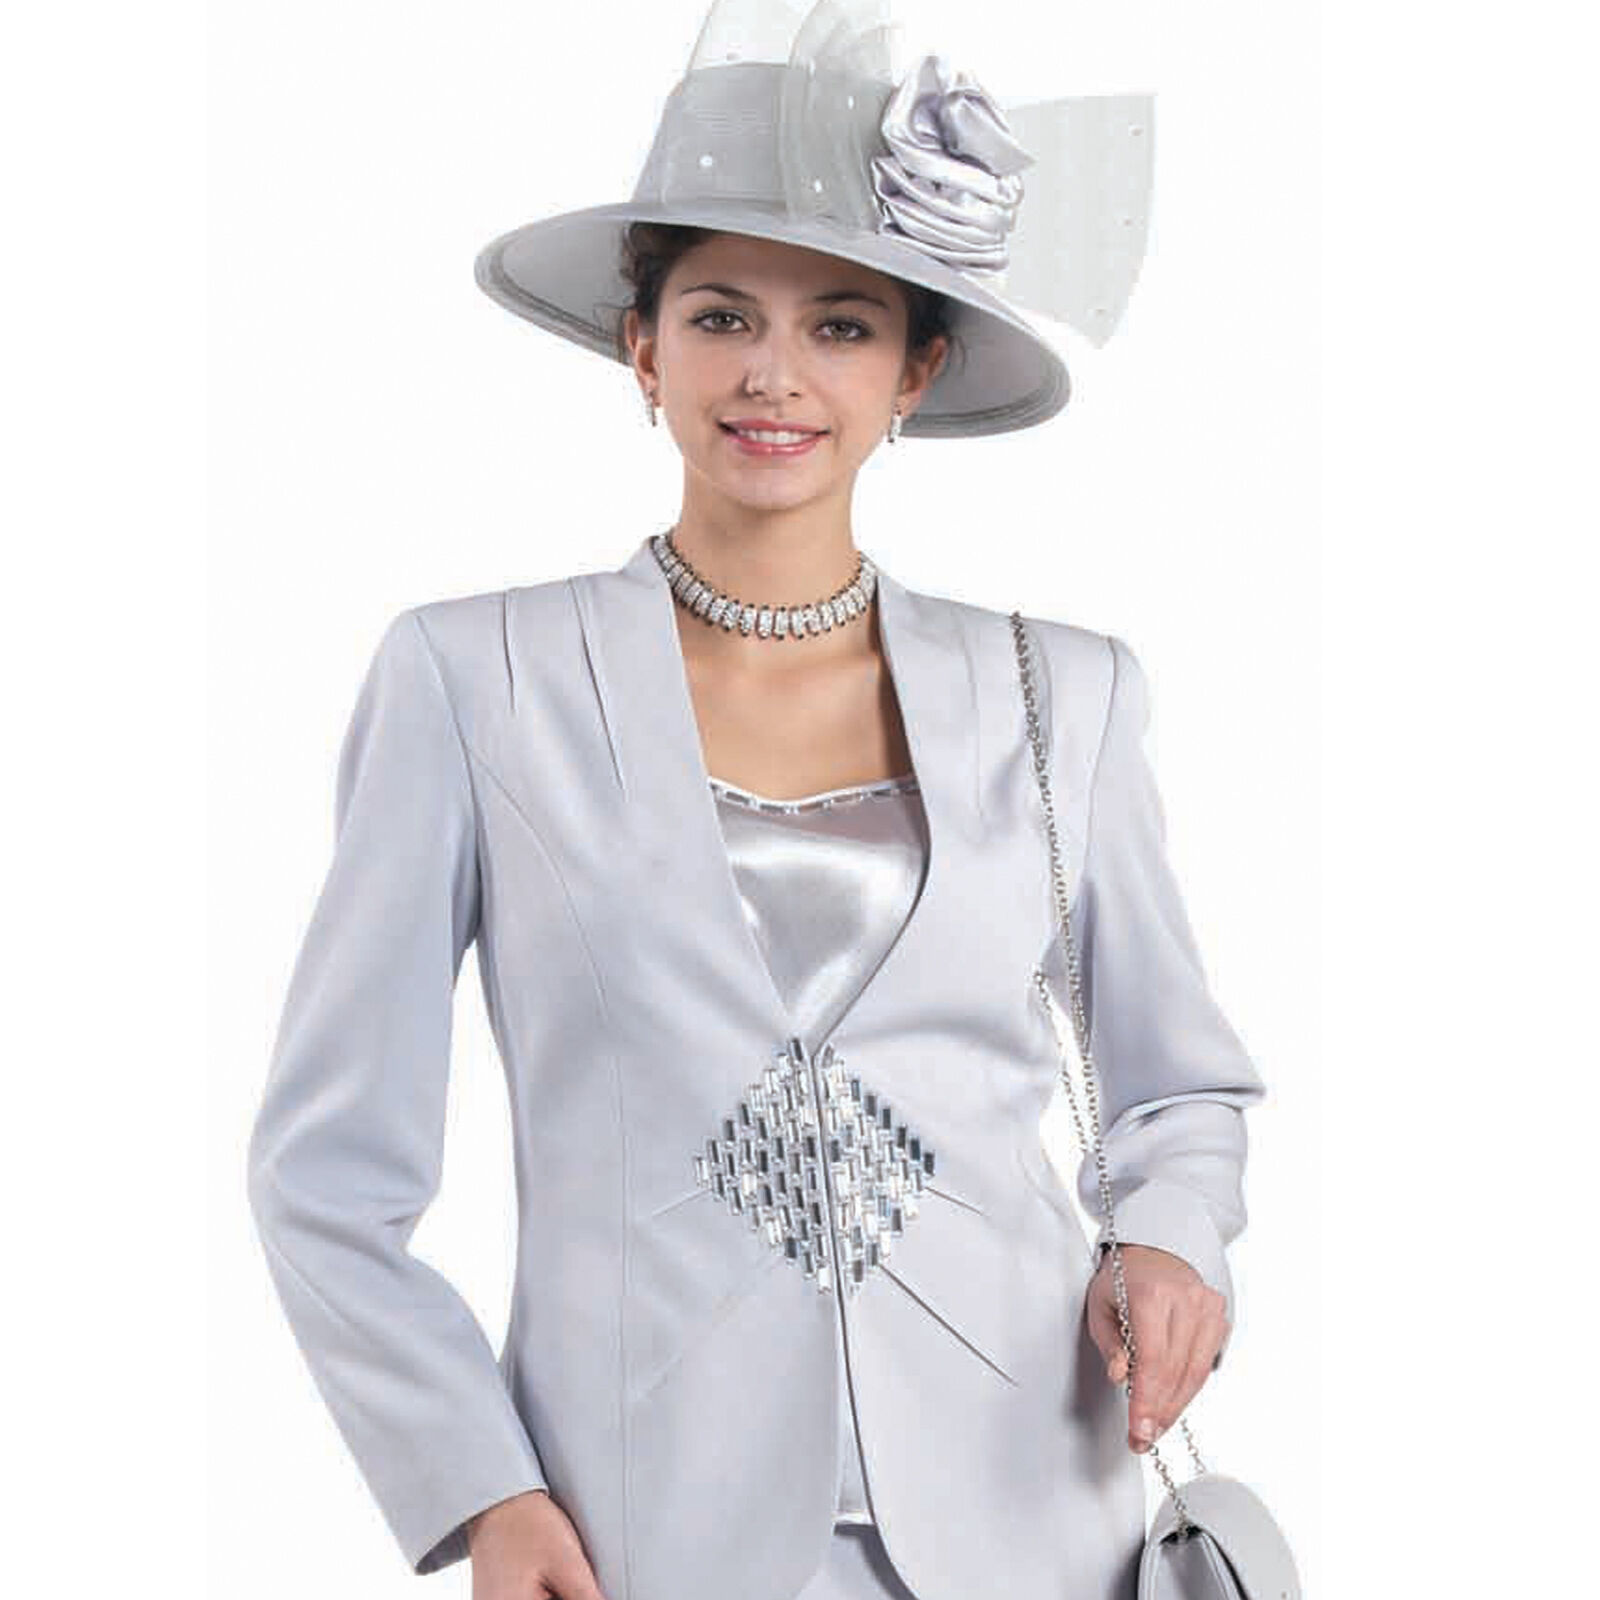 Sunday bäst kvinnor Church Suit - mjuk Crepe Fabric - ståard to Plus Storlek - L348